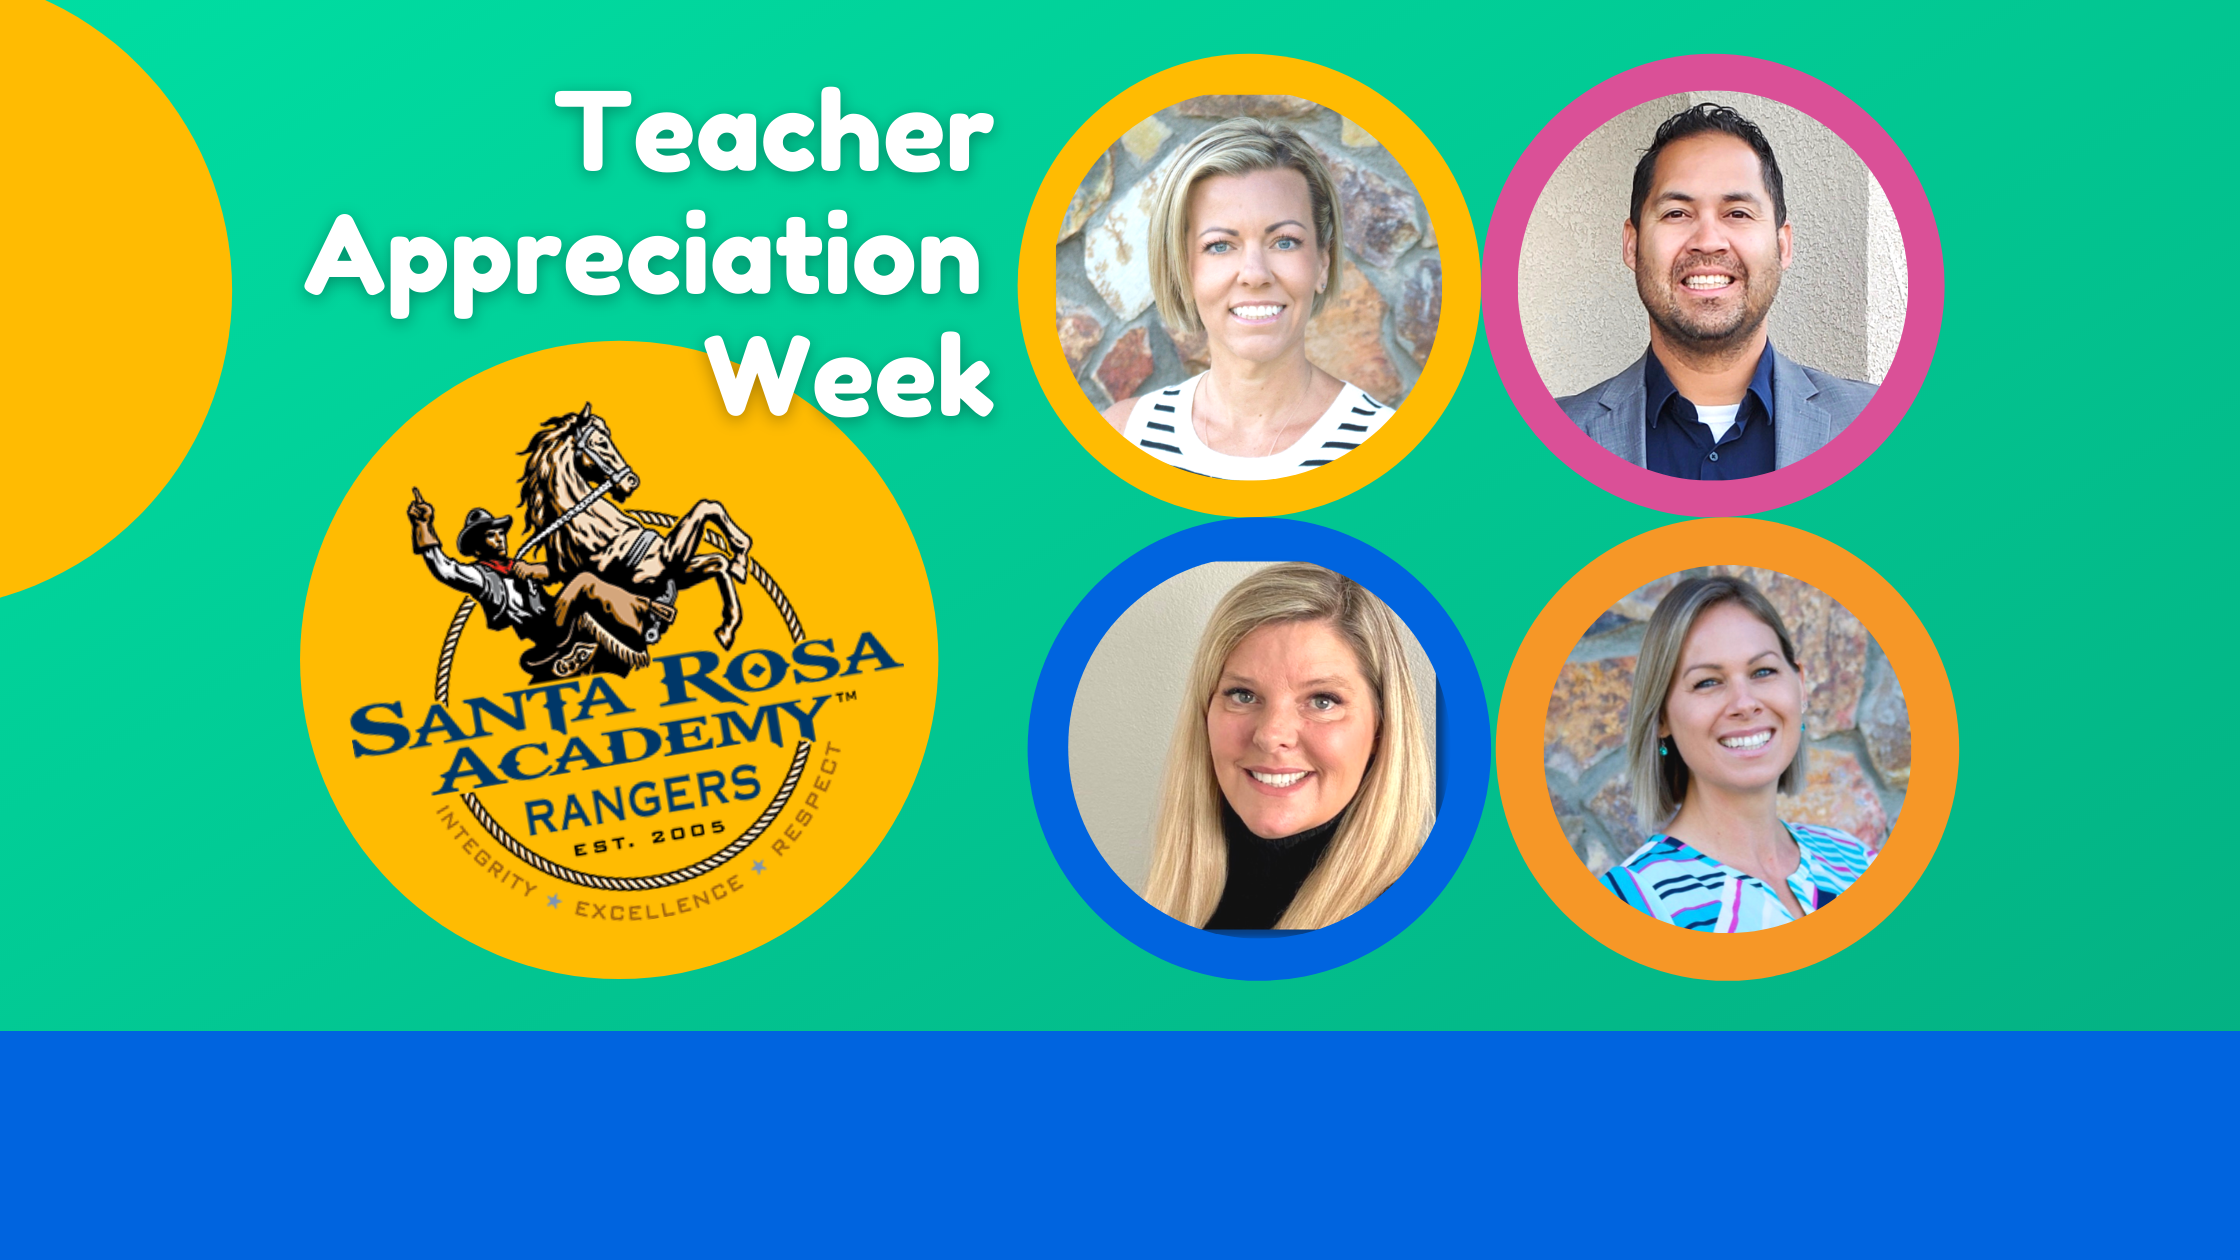 Teacher Appreciation Week: Spotlight on Santa Rosa Academy